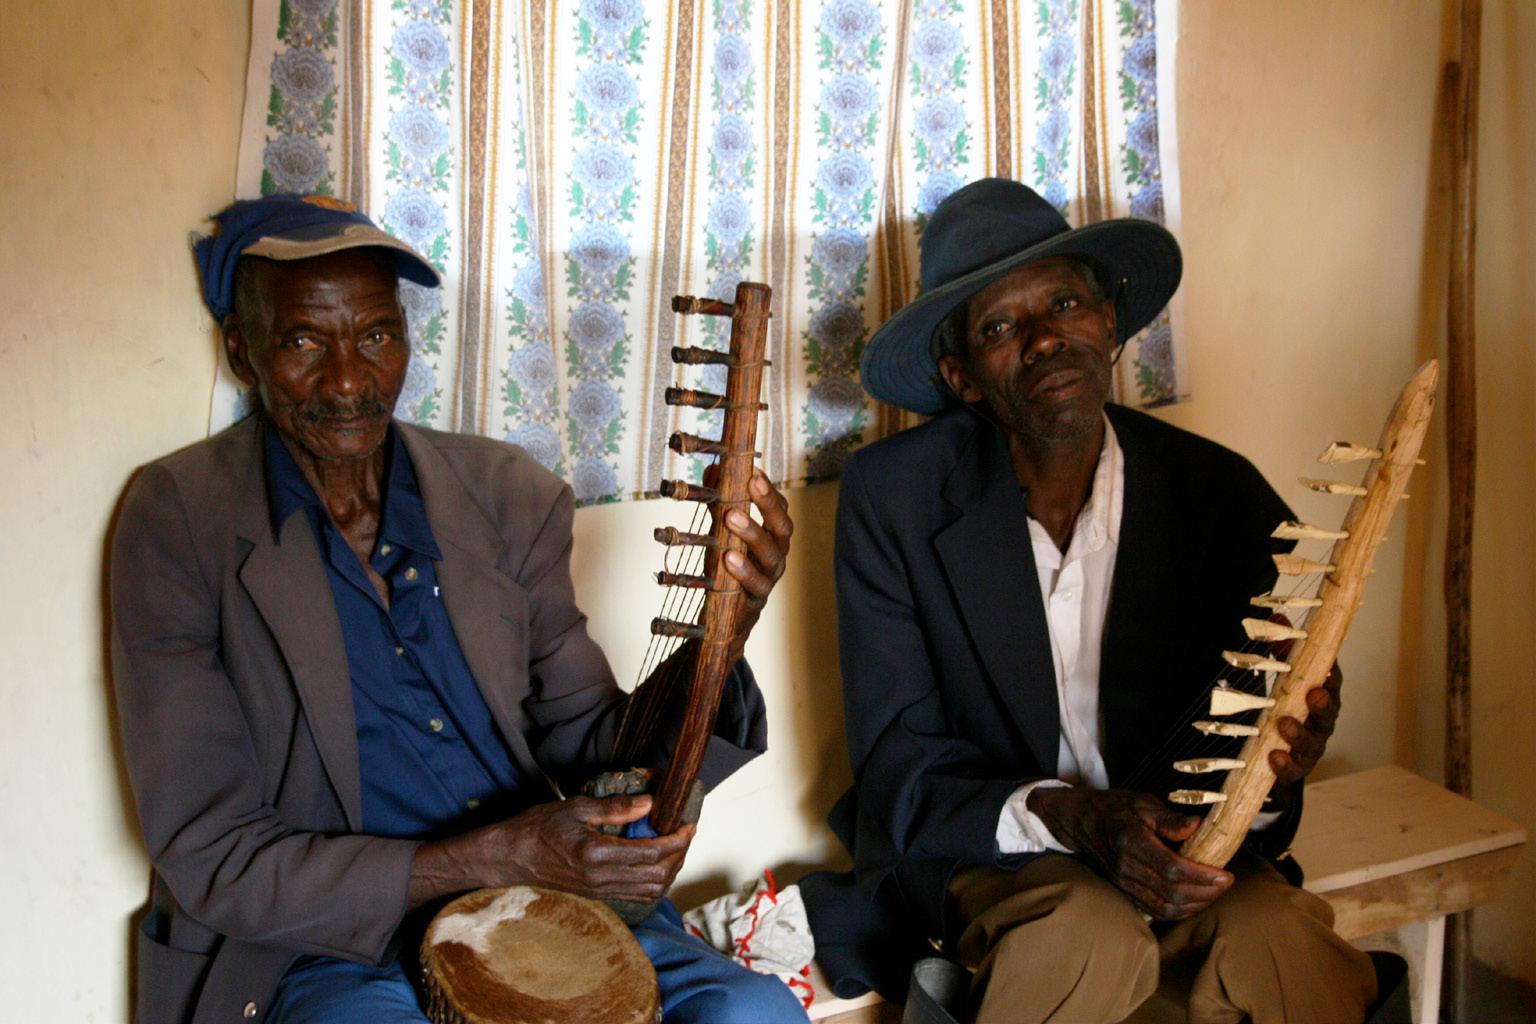 FIGURA 3. Da sinistra, Zedekyia e Kule Apolo Ngholhogho, Ibanda 2008 (foto: V. V. Crupi).